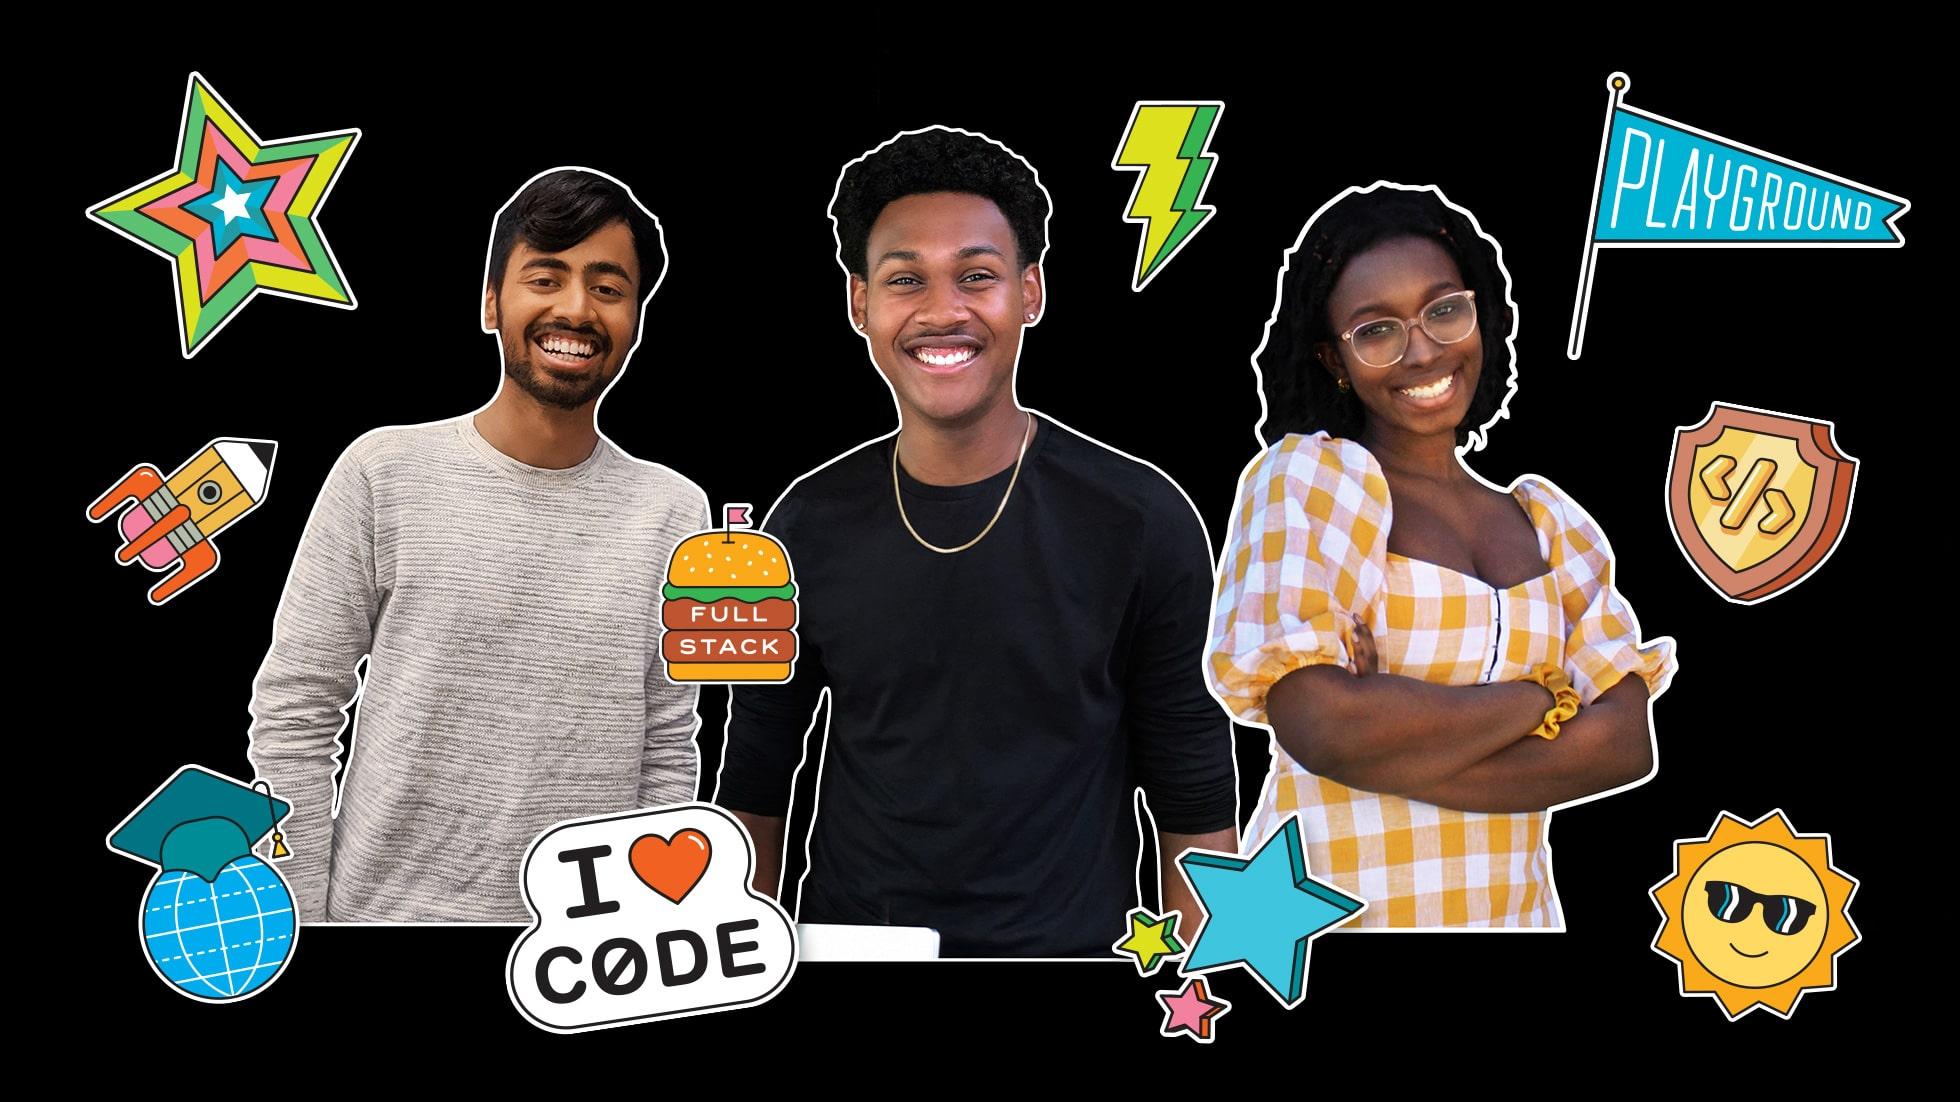 Estudantes vencedores do desafio da WWDC20